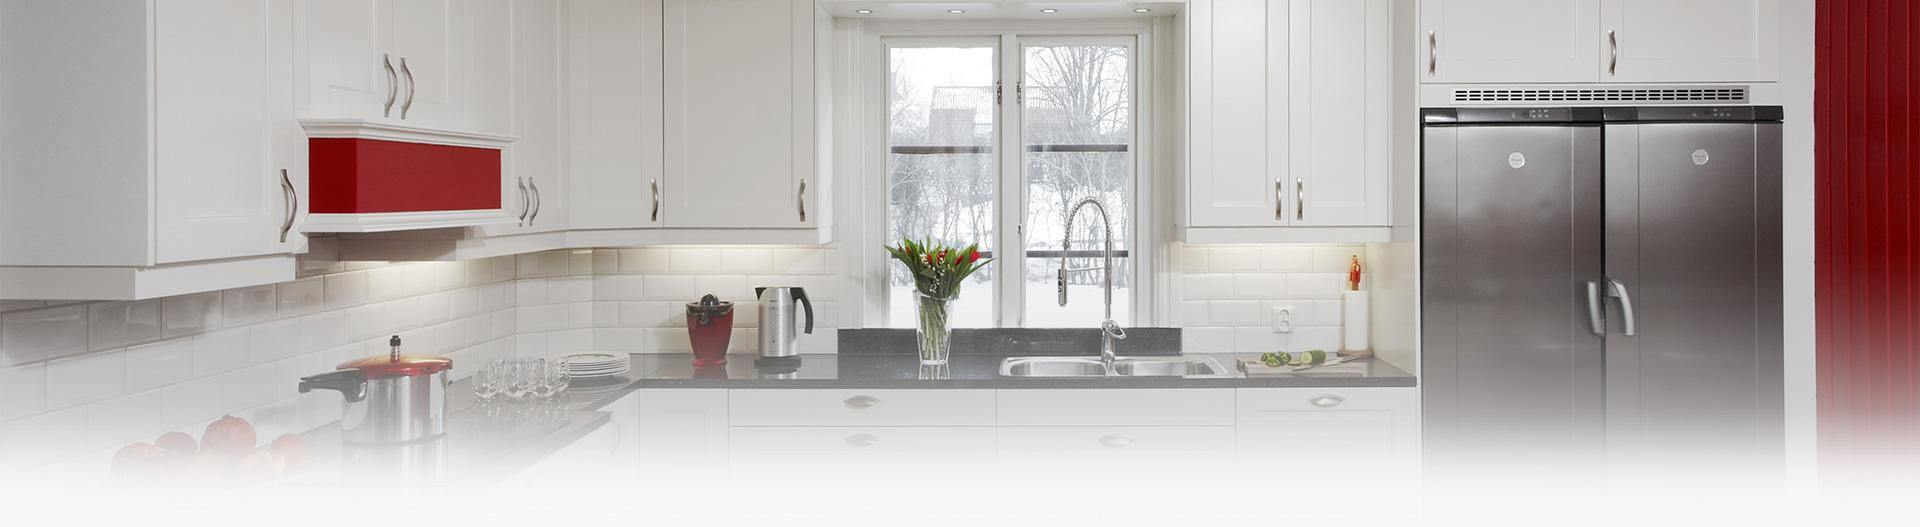 Luckbyte, enkel köksrenovering på fyra timmar - Novaflex.se